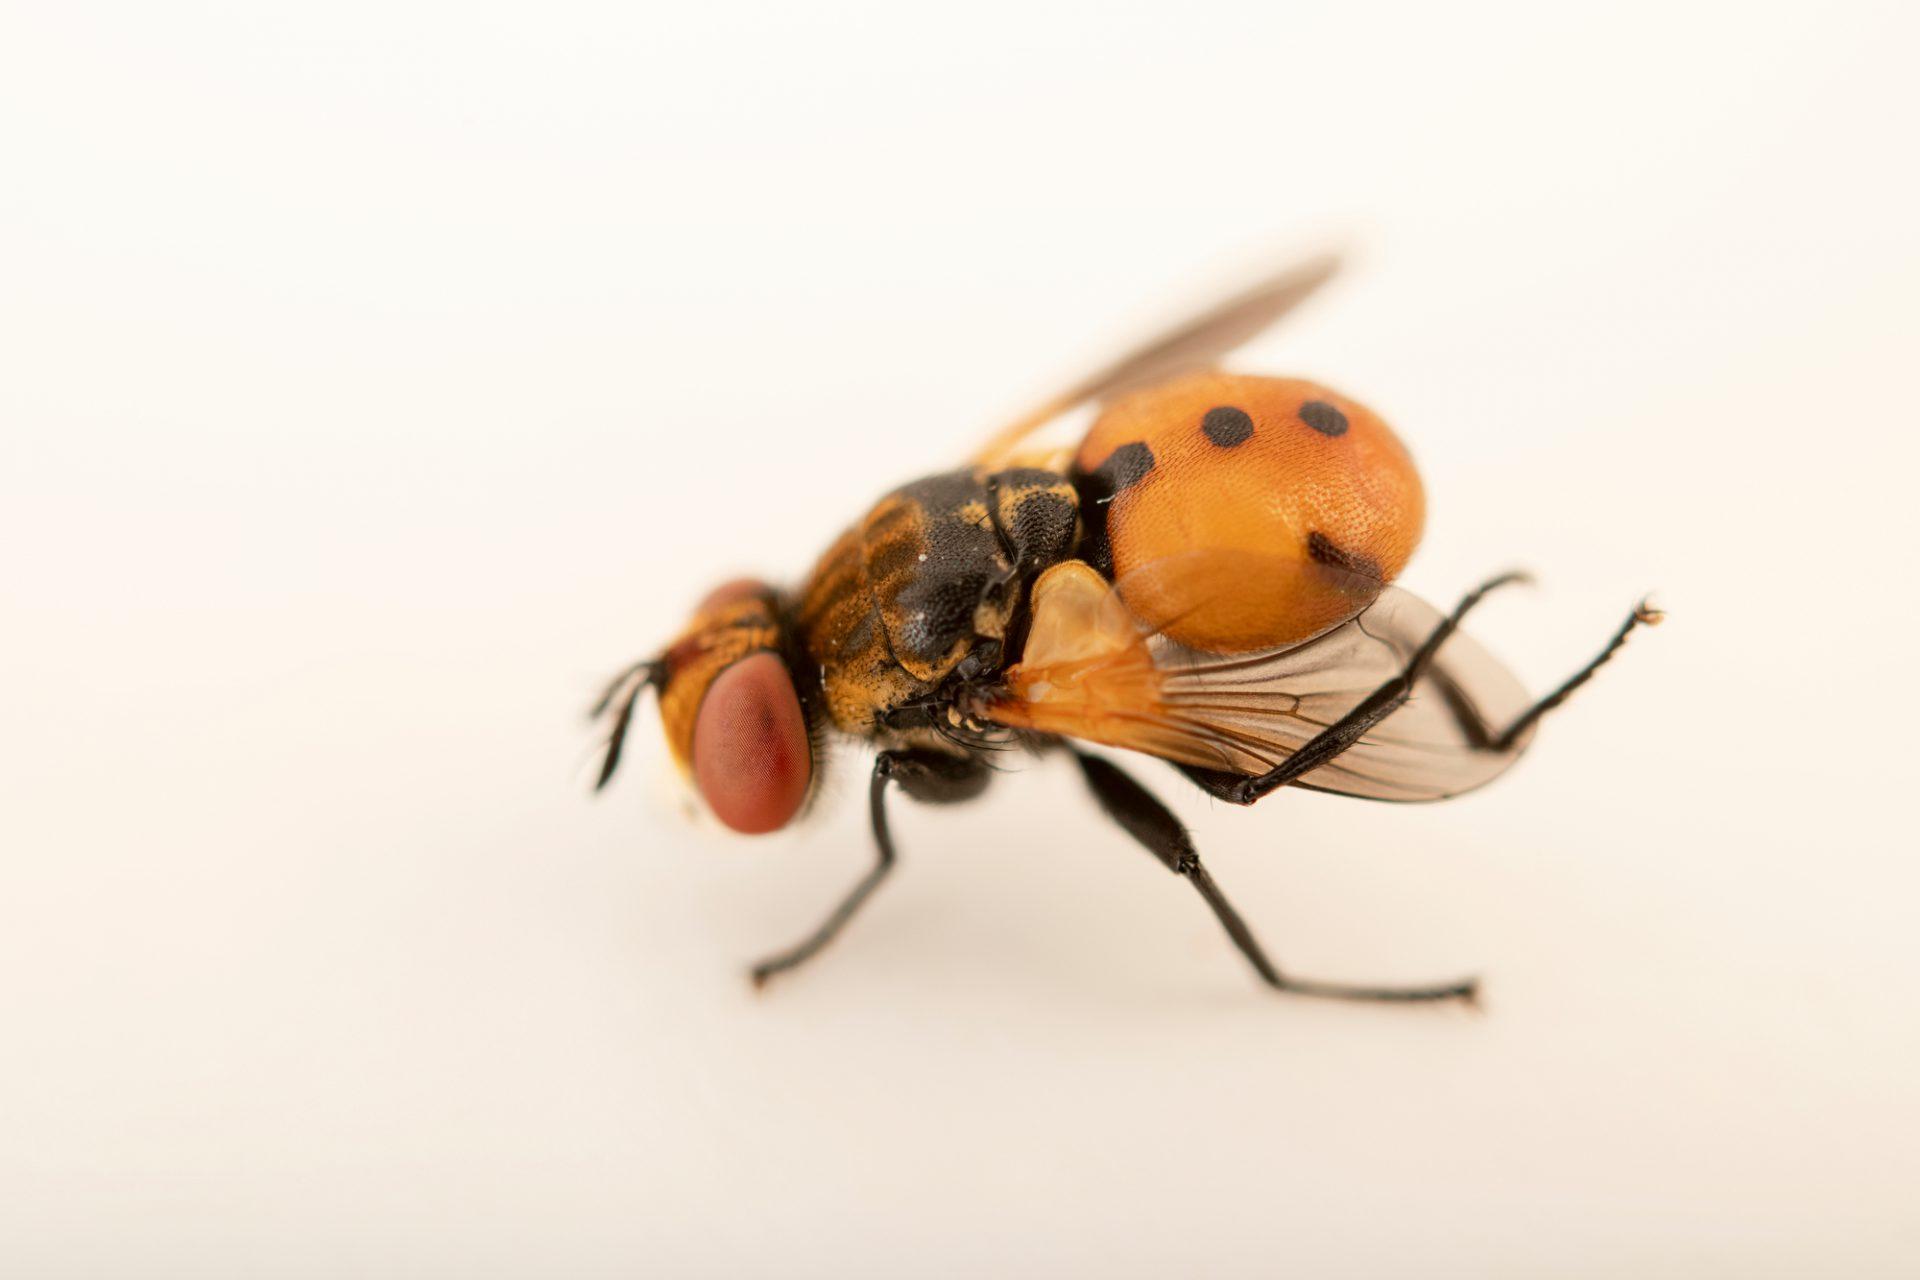 Photo: An unidentified fly at Graham's Quinta dos Malvedos Vineyard.